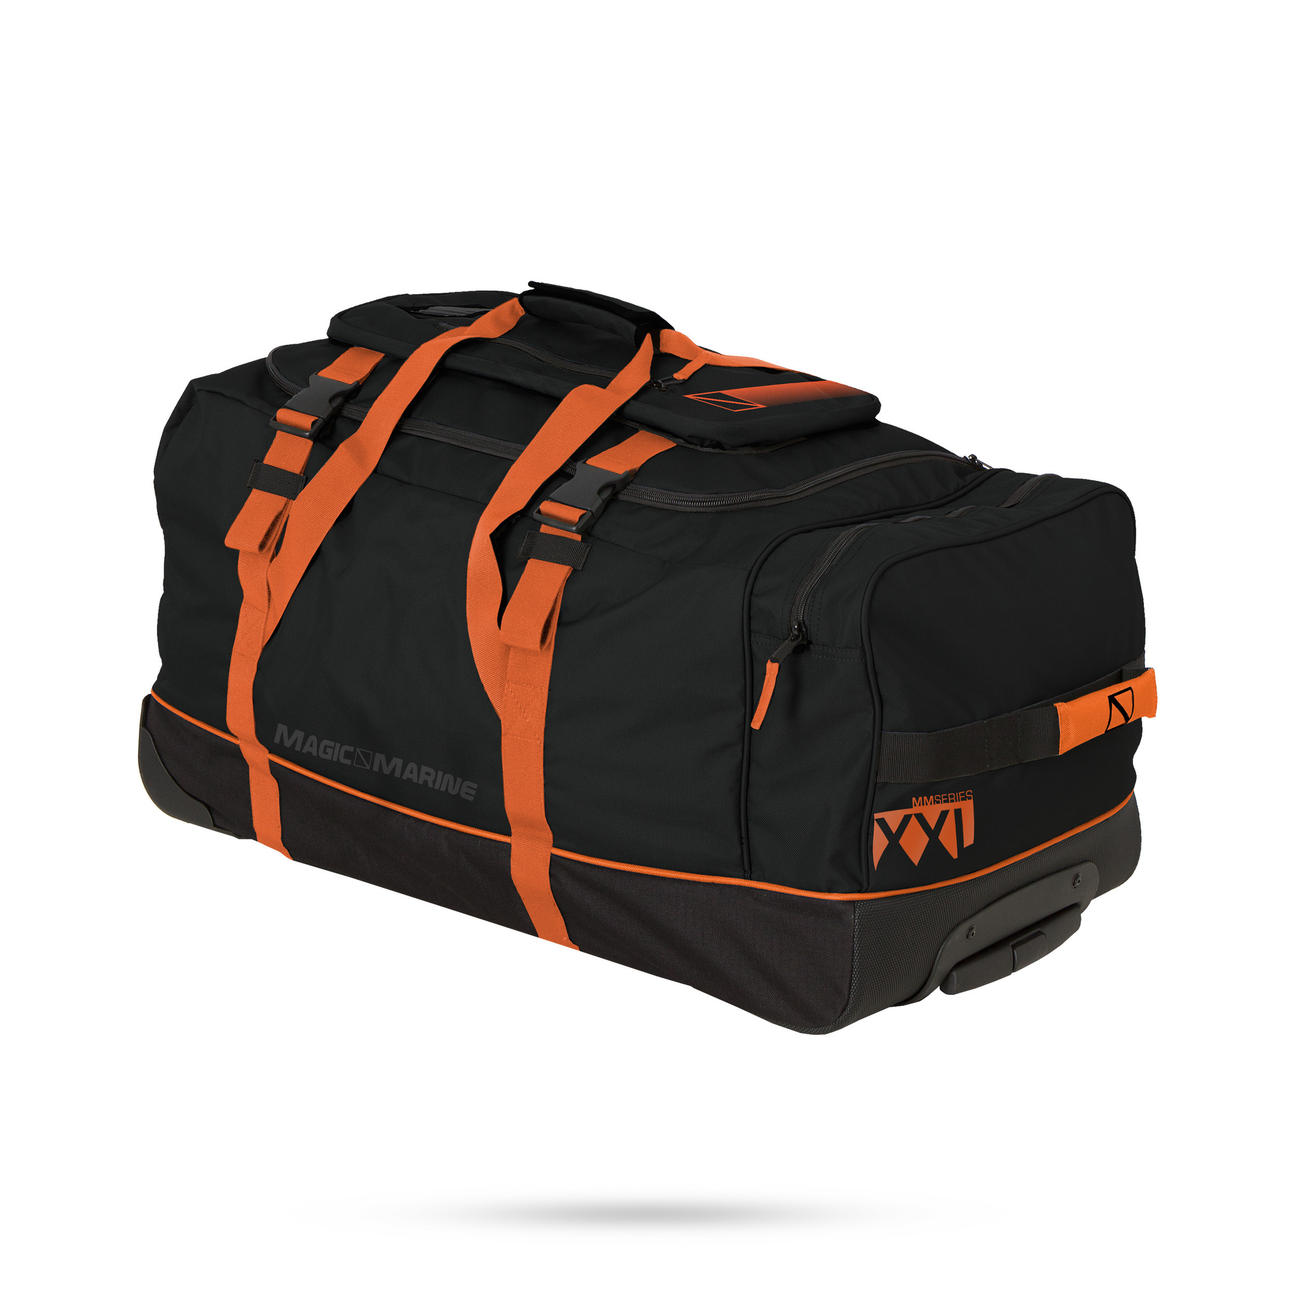 SAILING BAG XXL 125L 大容量ソフトキャリー